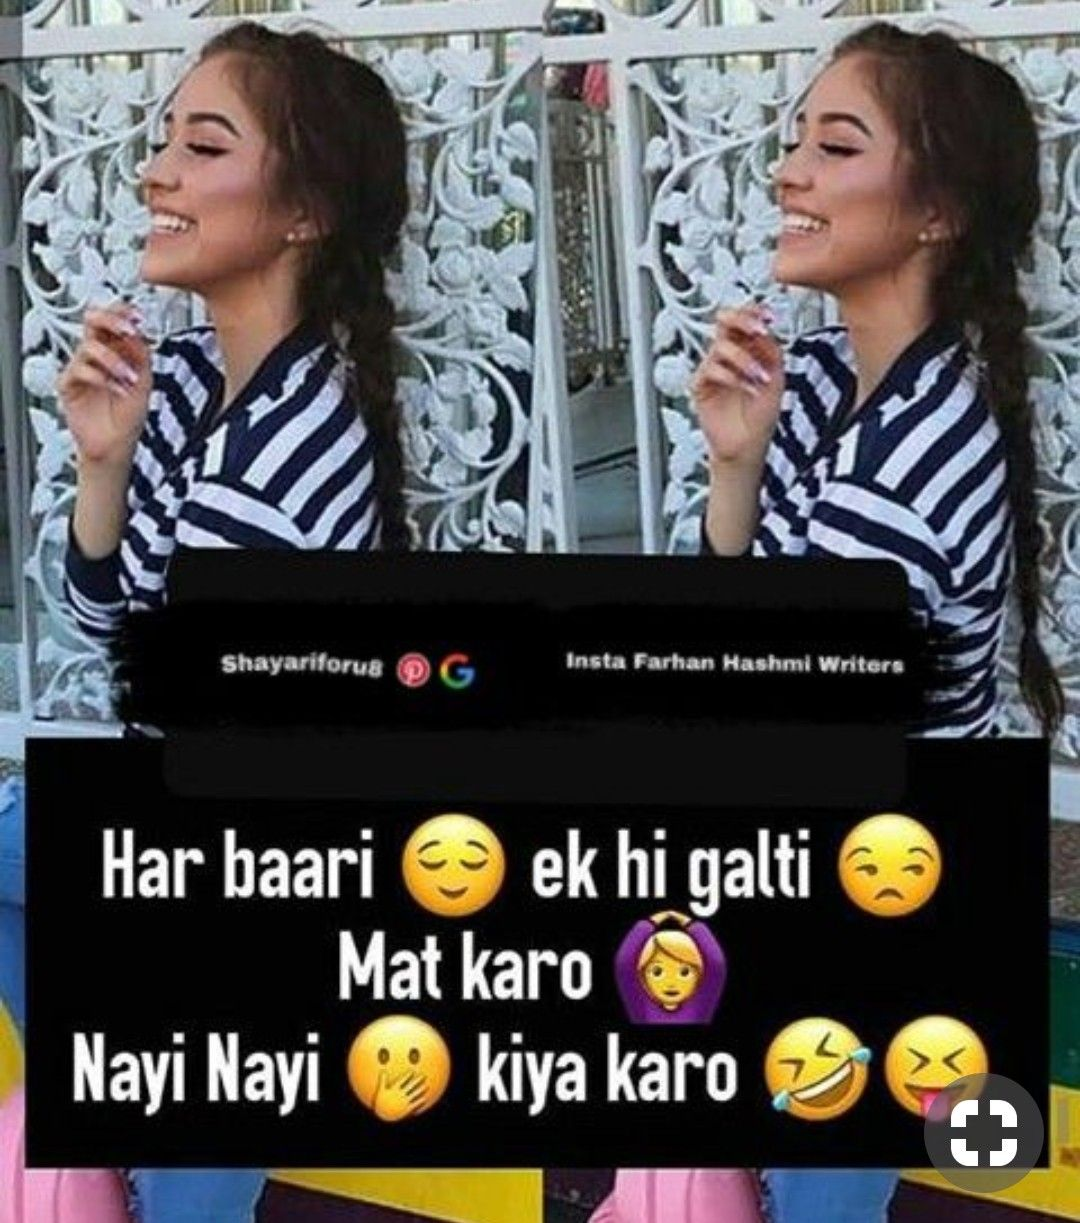 Pin By Tahsin Farmeena On Attitude Quotes Funny Girl Quotes Friends Quotes Funny Friend Quotes For Girls